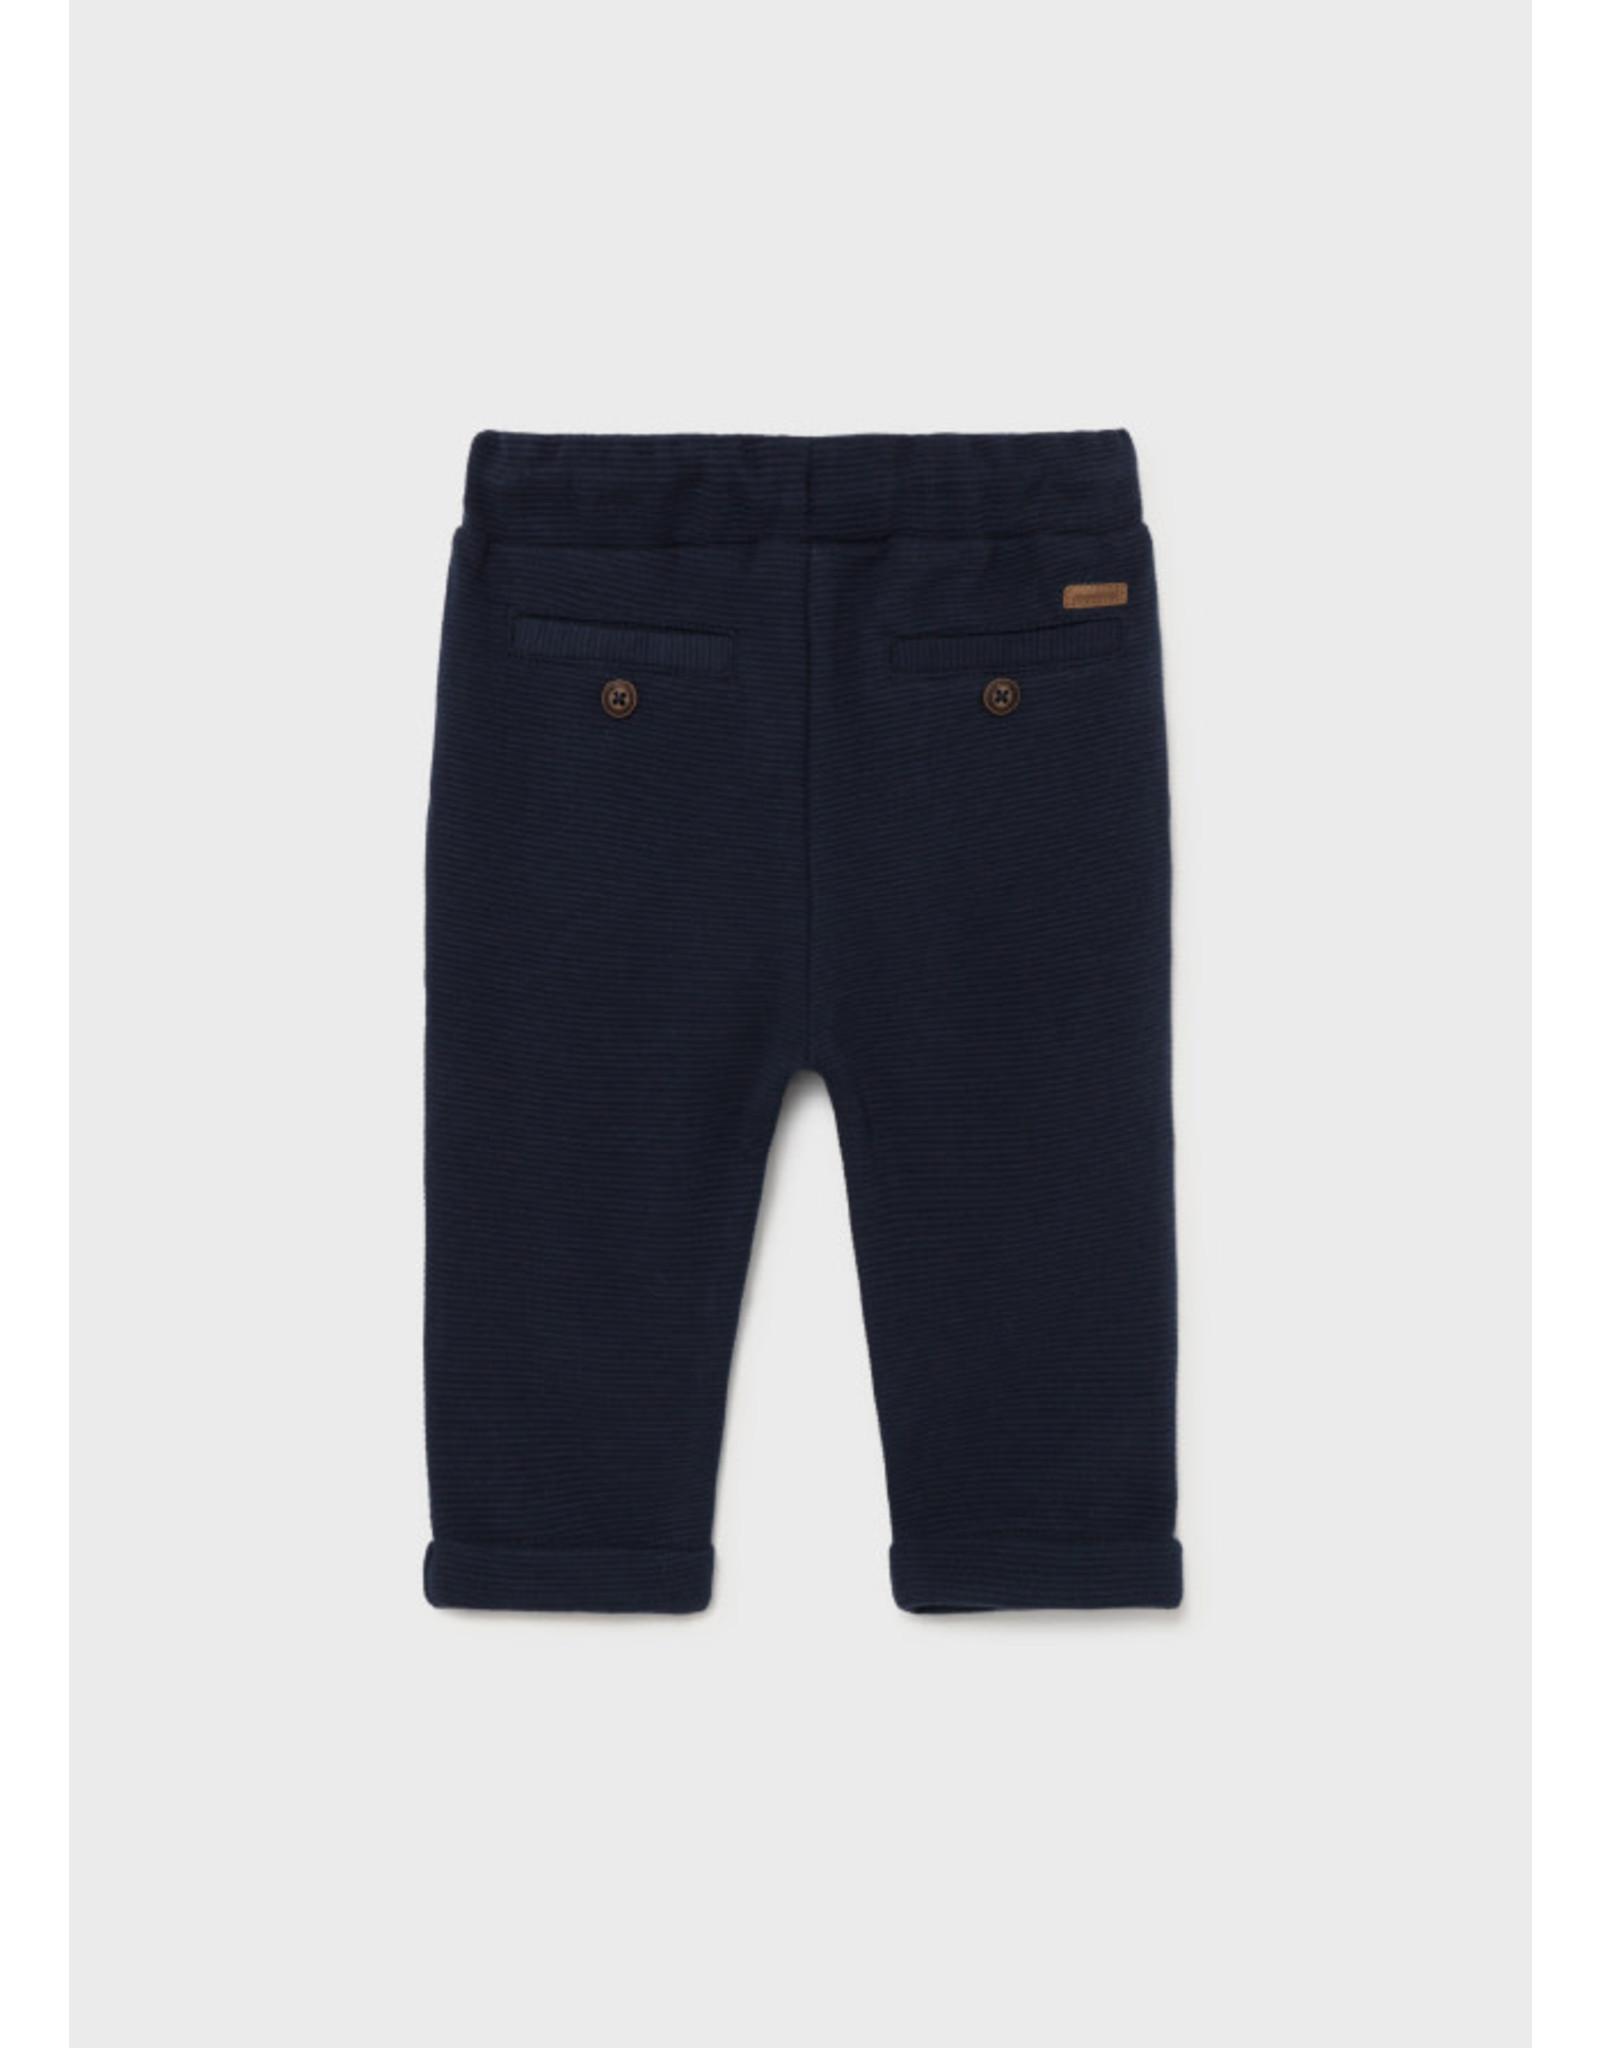 Mayoral Blue Toddler Knit Pants